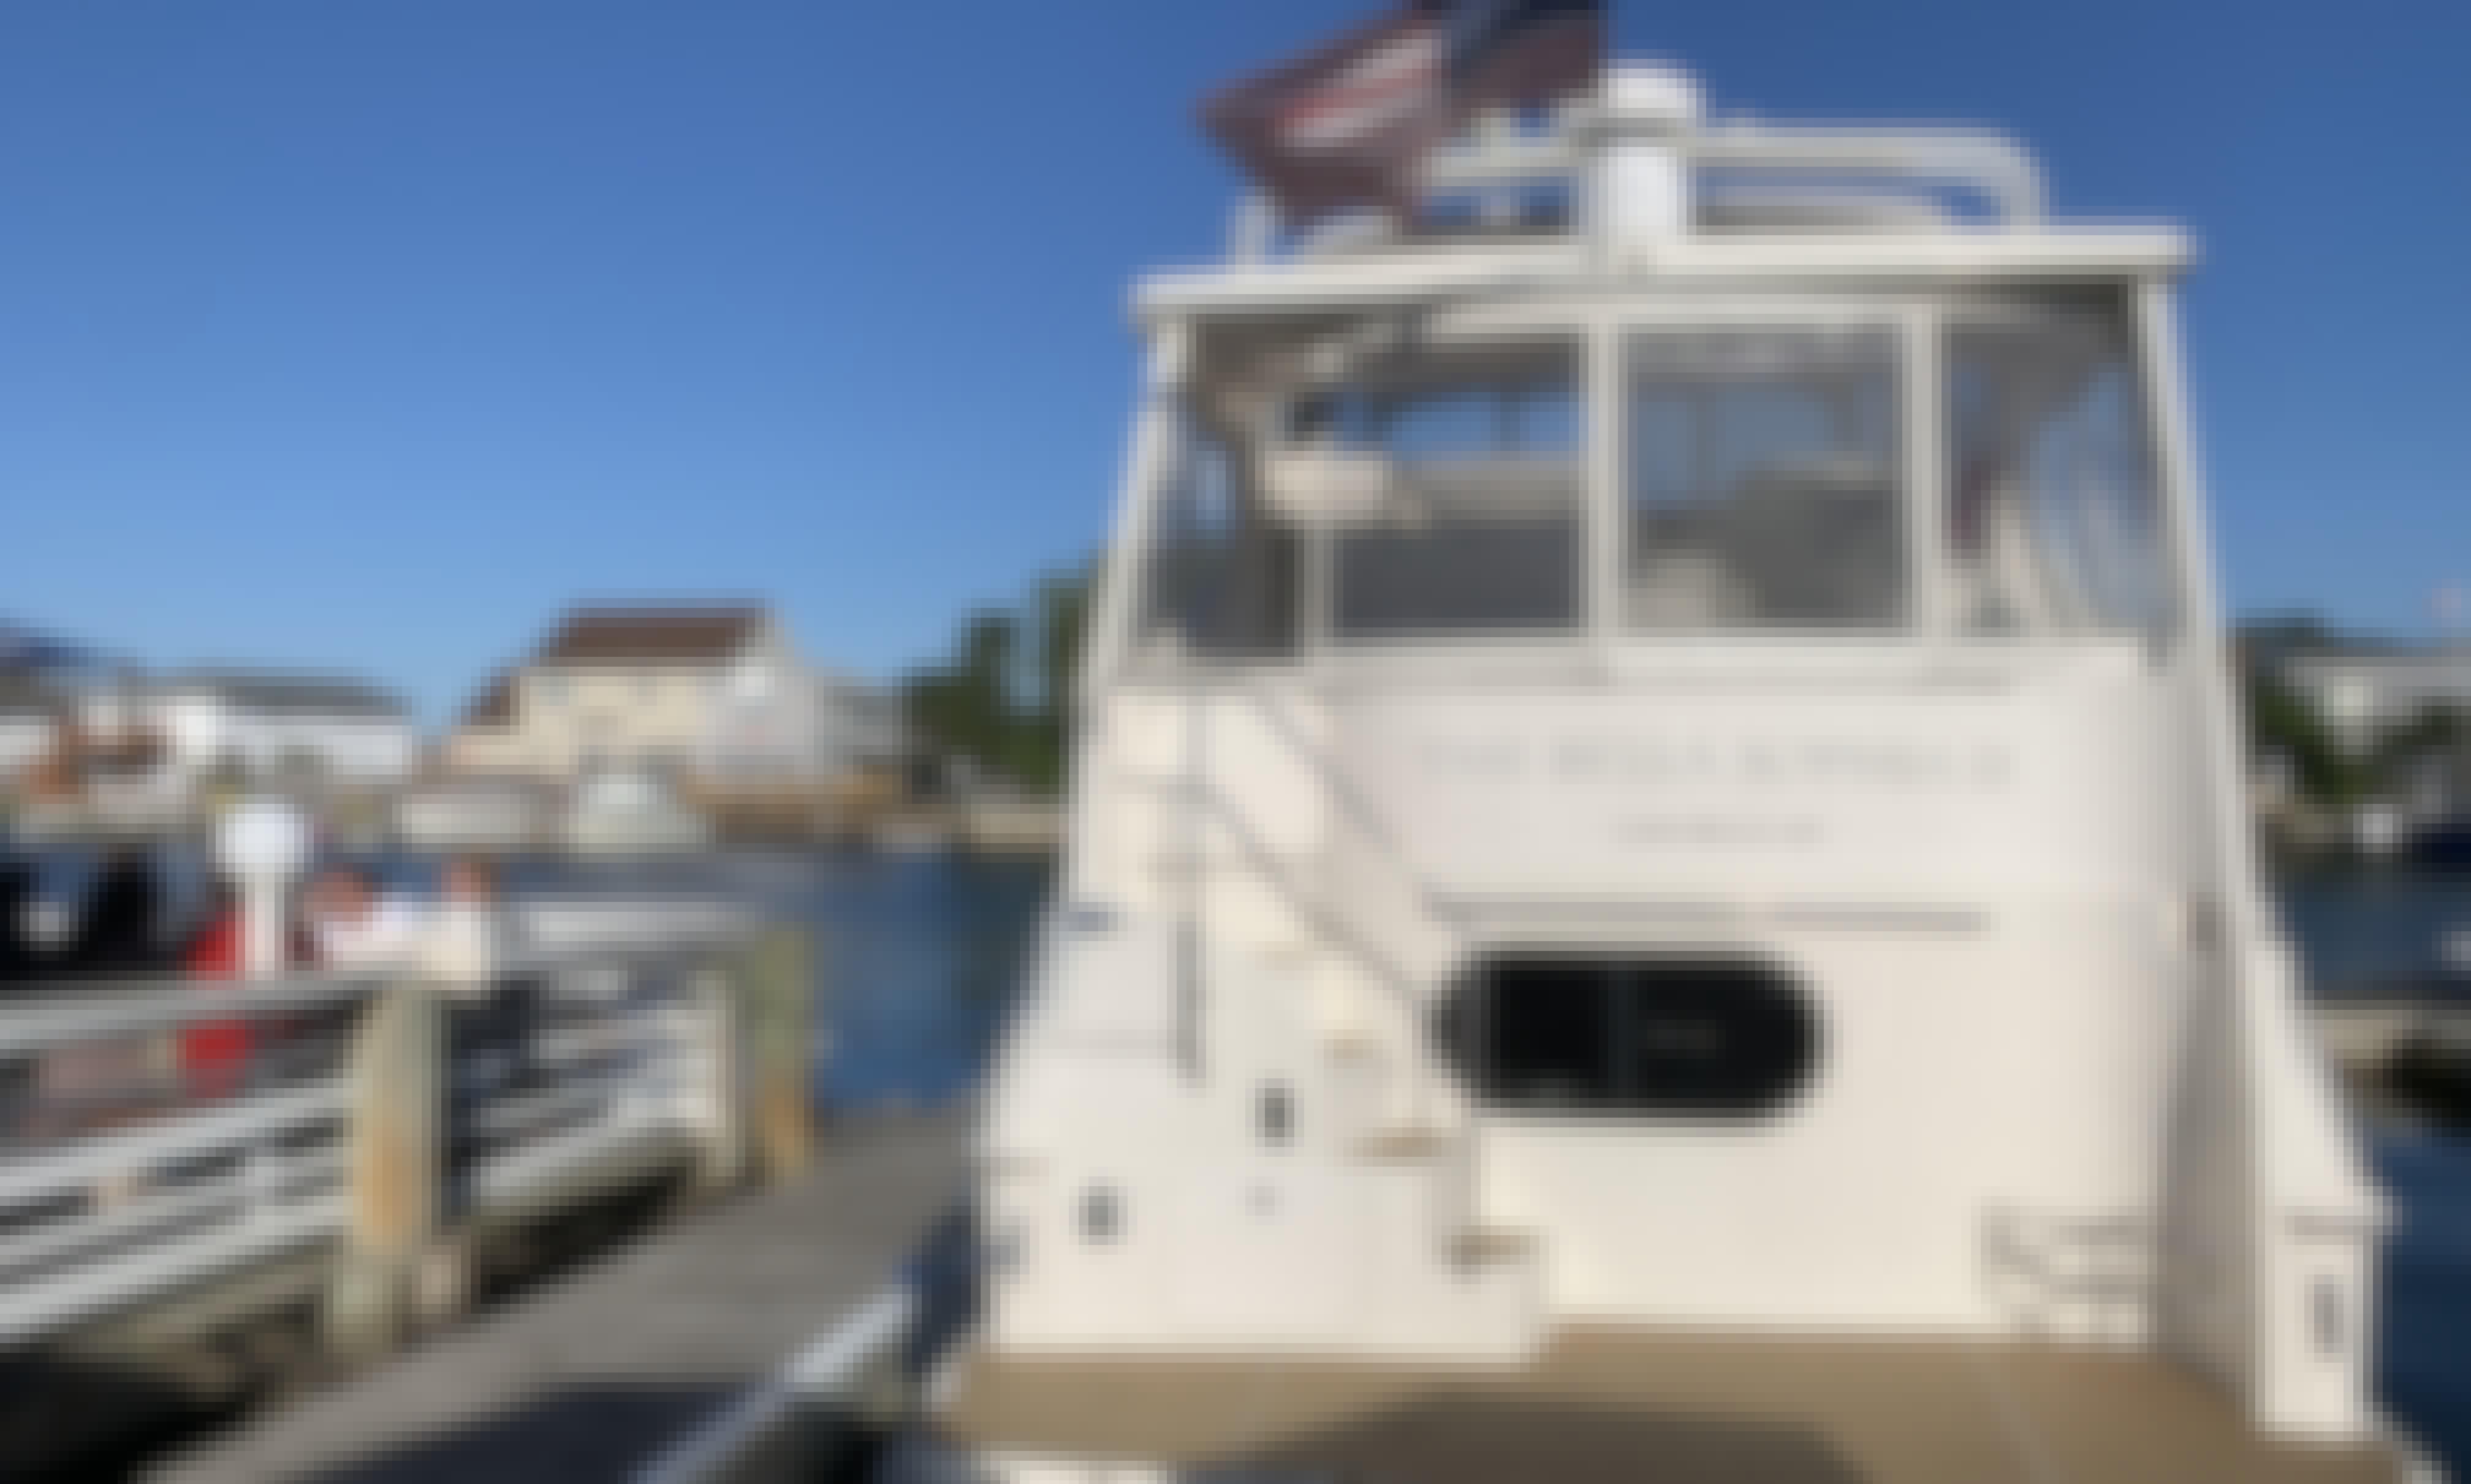 Silverton 43 Motor Yacht Rental in Island Park, New York